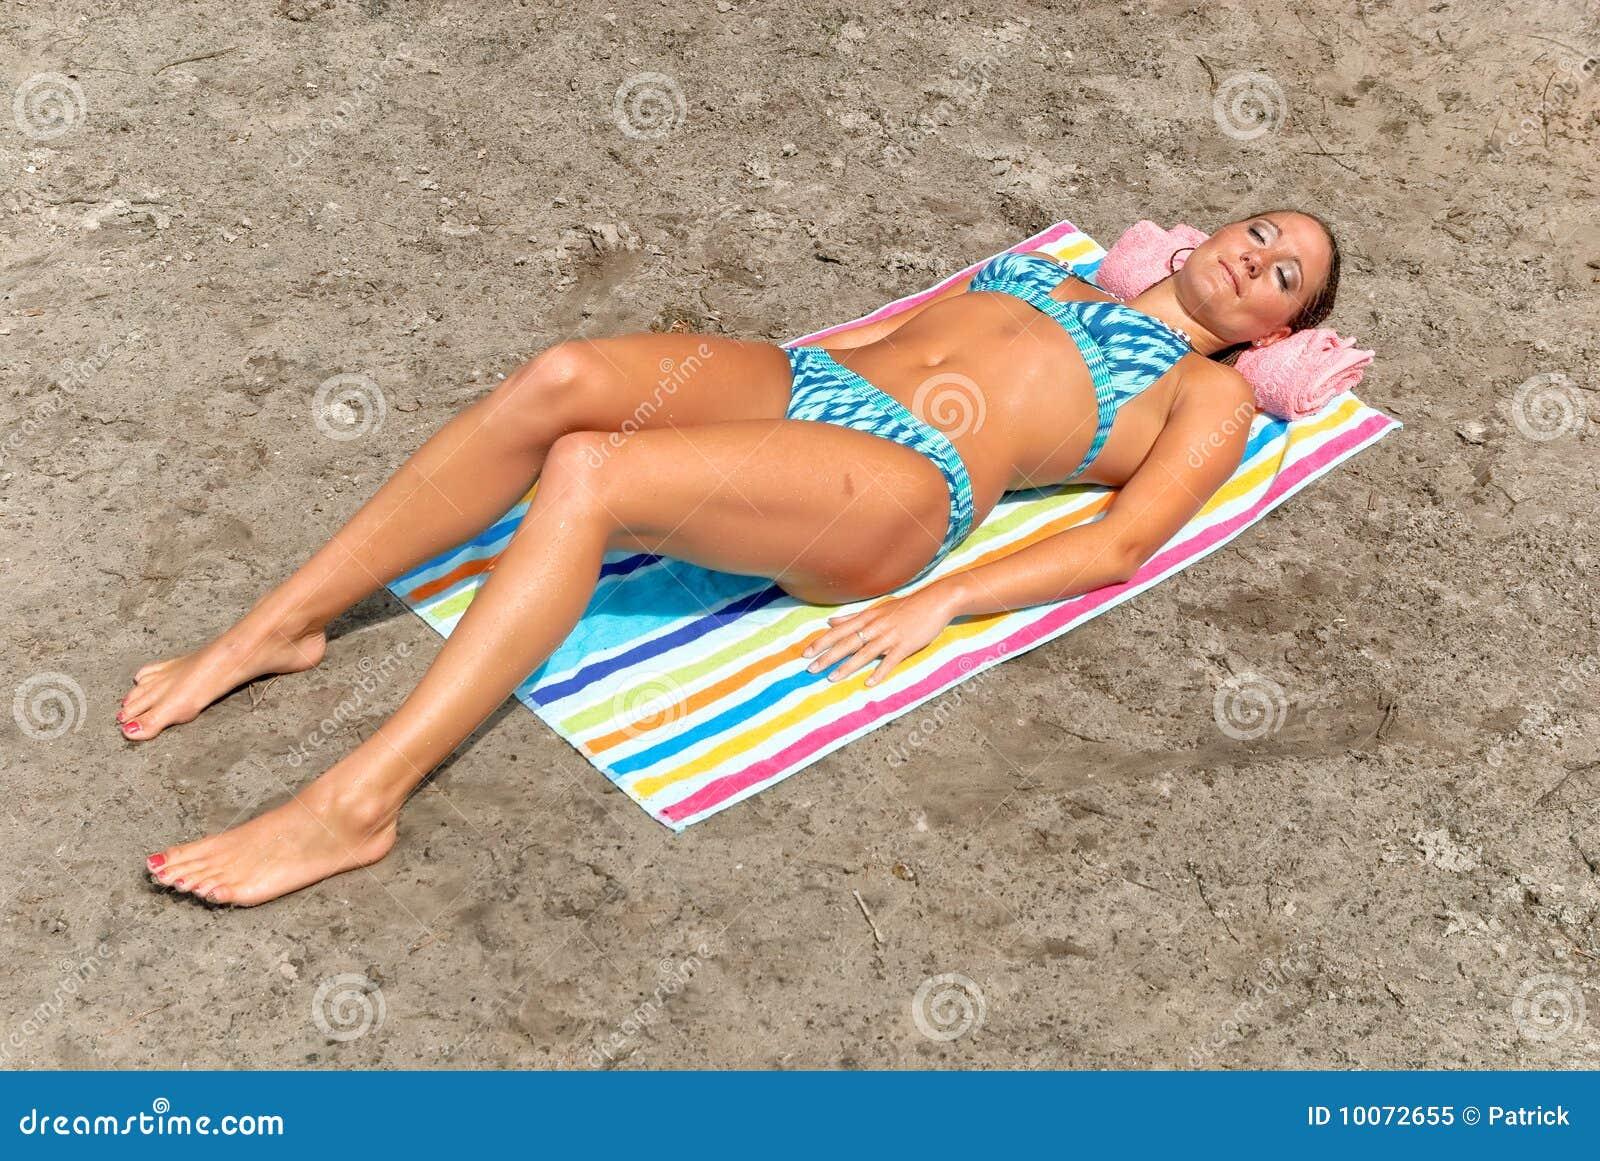 Teen beach sunbathing